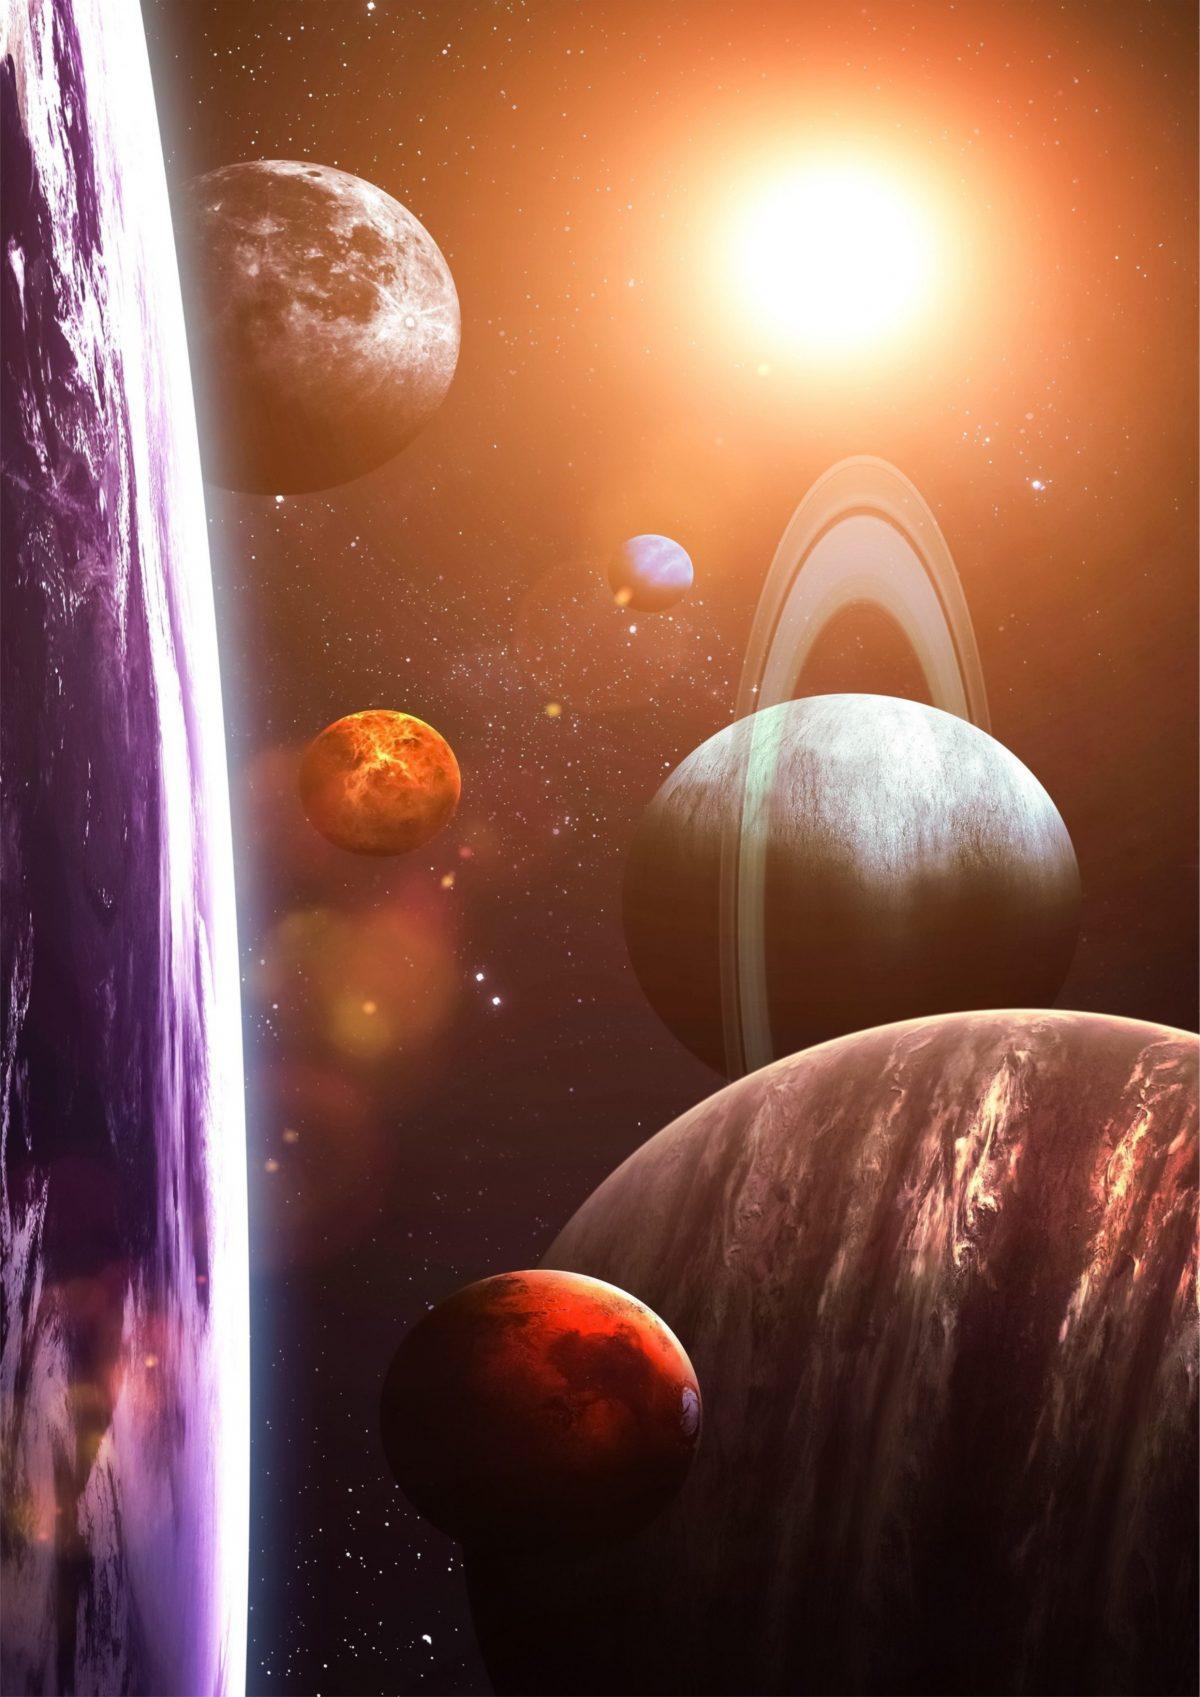 Солнечная система вид с орбиты Земли